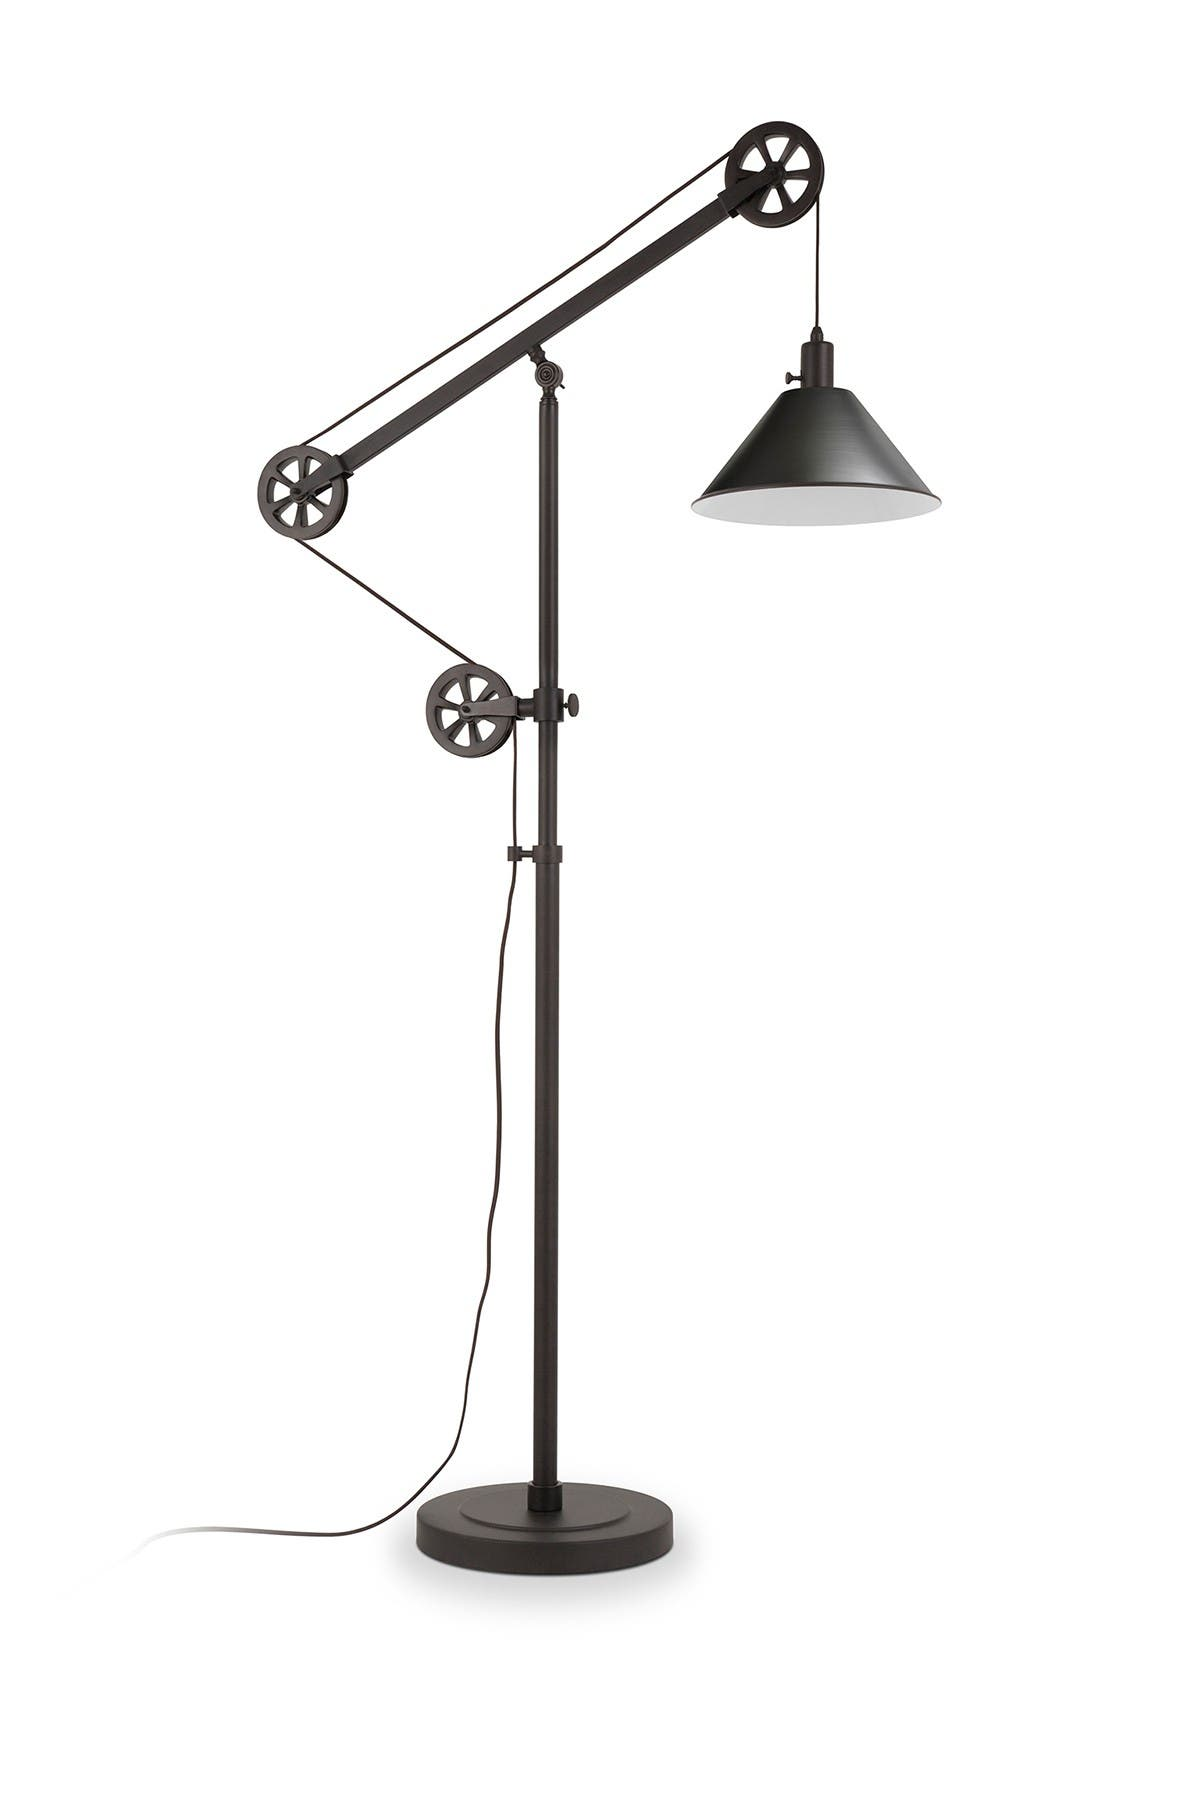 Image of Addison and Lane Descartes Floor Lamp - Blackened Bronze